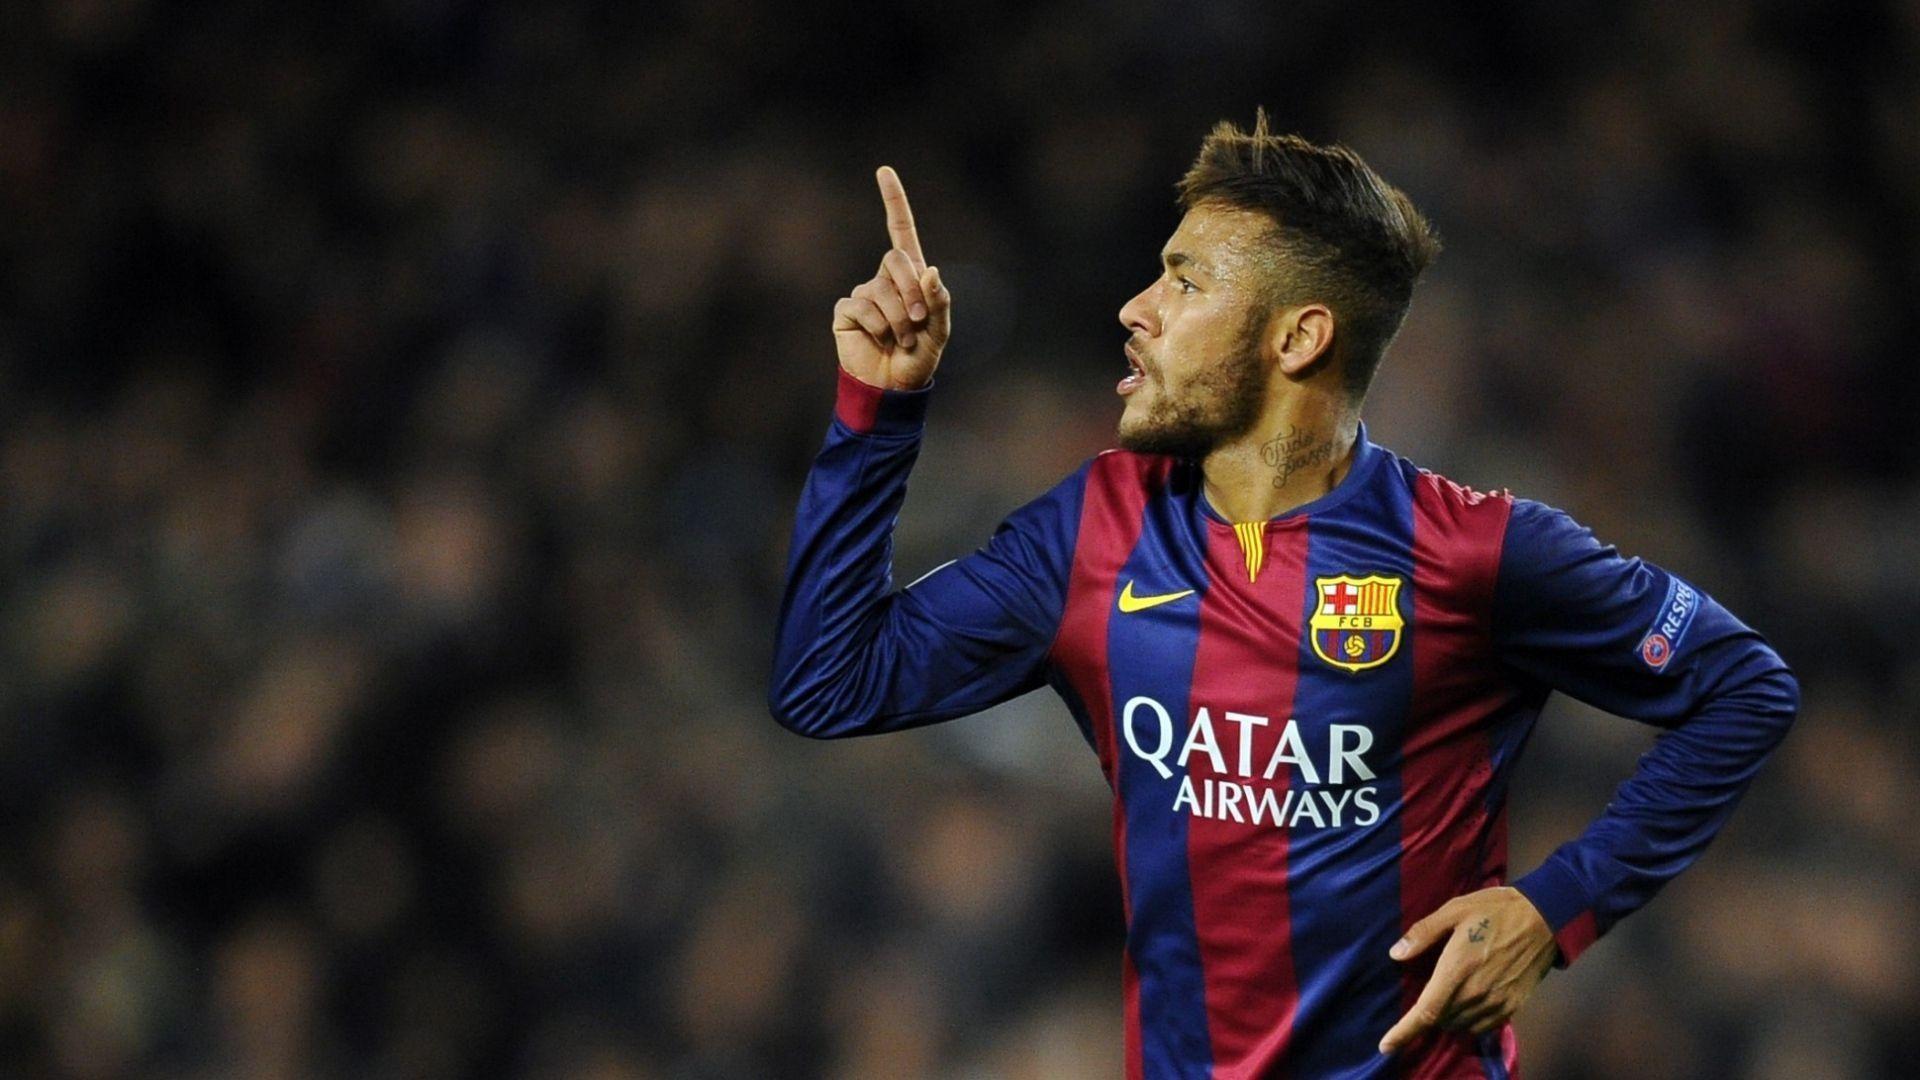 1920x1080 Neymar Barcelona Player Wallpaper HD